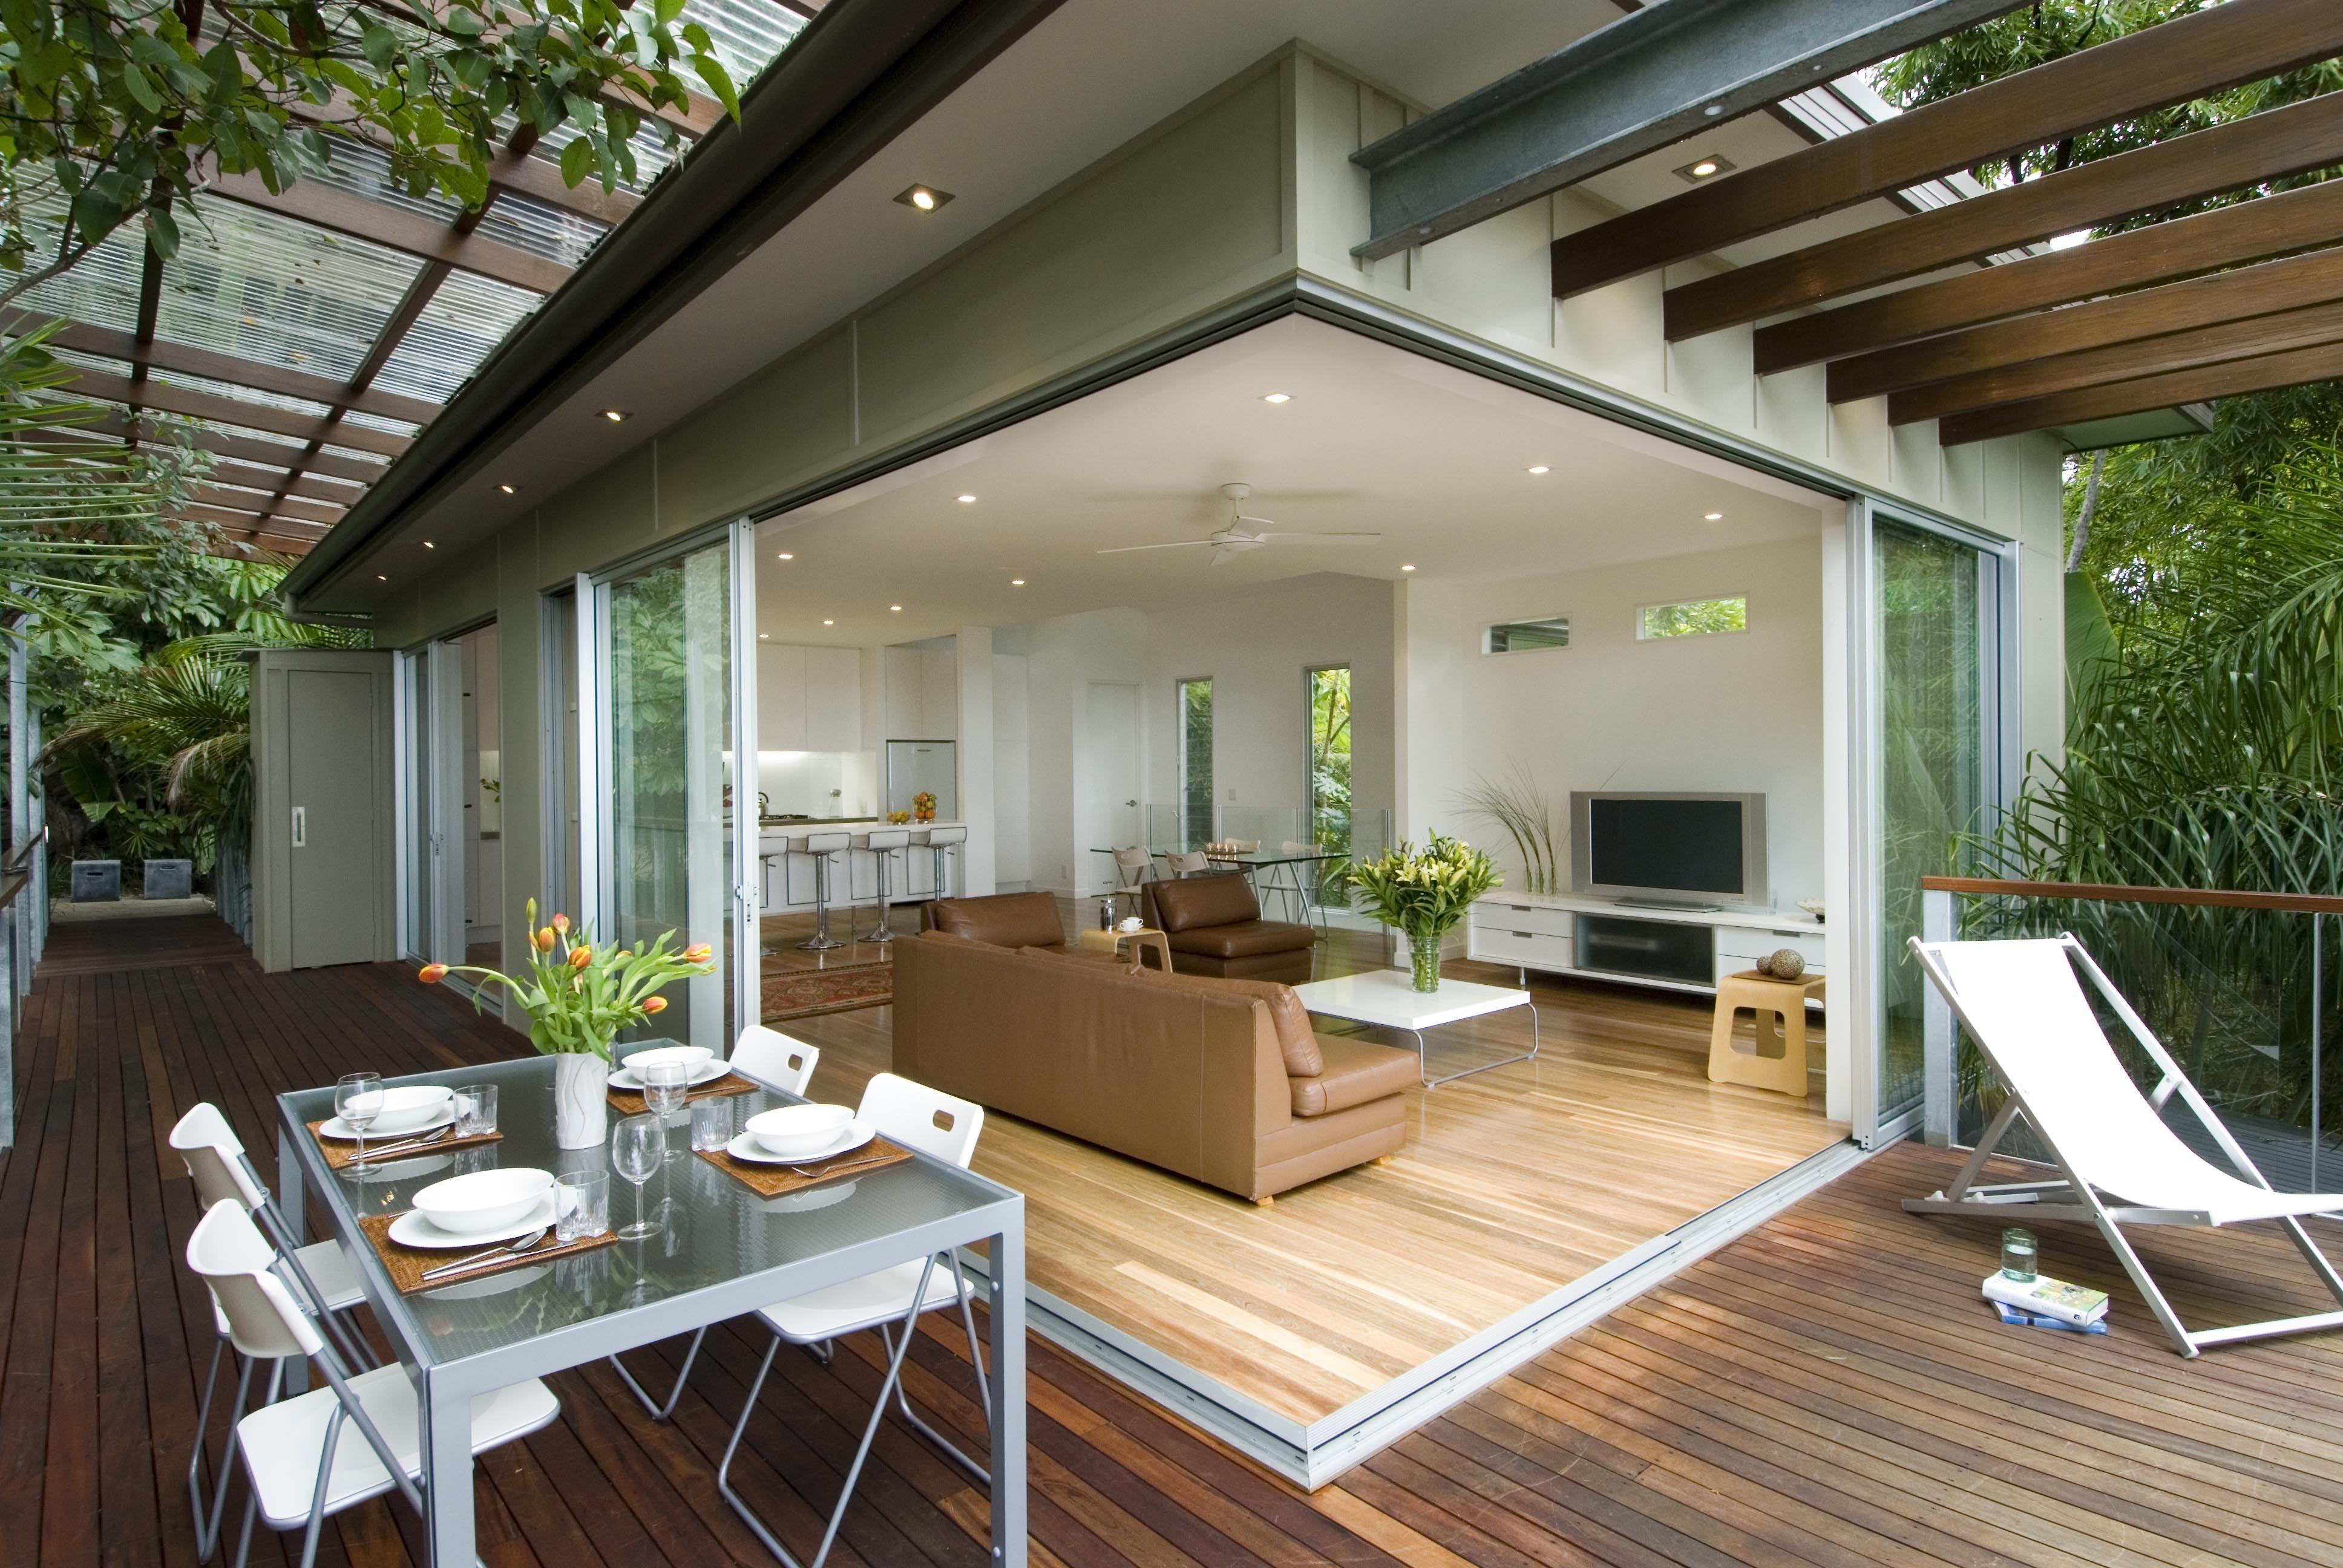 Steep Hillside House Plans  New home design ideas  Heaven on a hillside  architecture